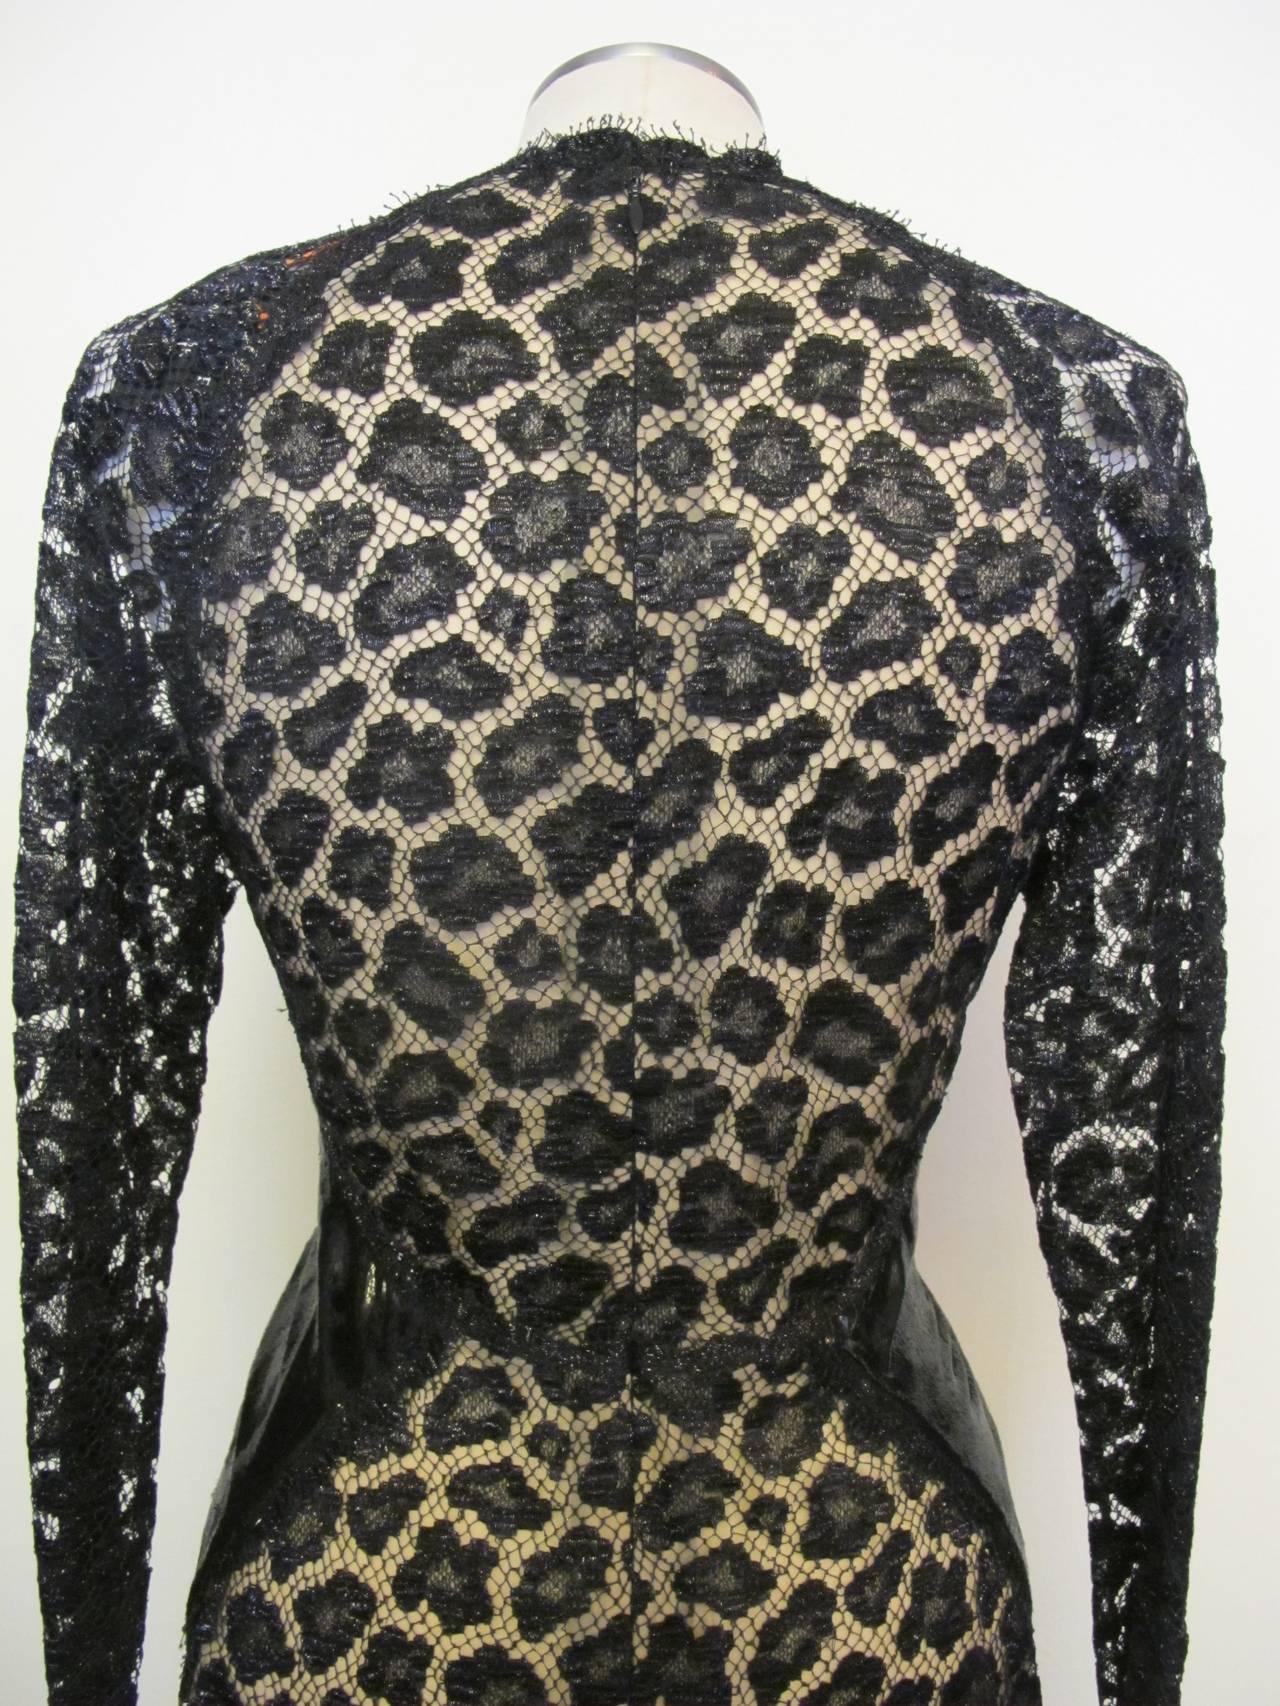 Geoffrey Beene Black Lace Cocktail Dress with Leopard Design 8